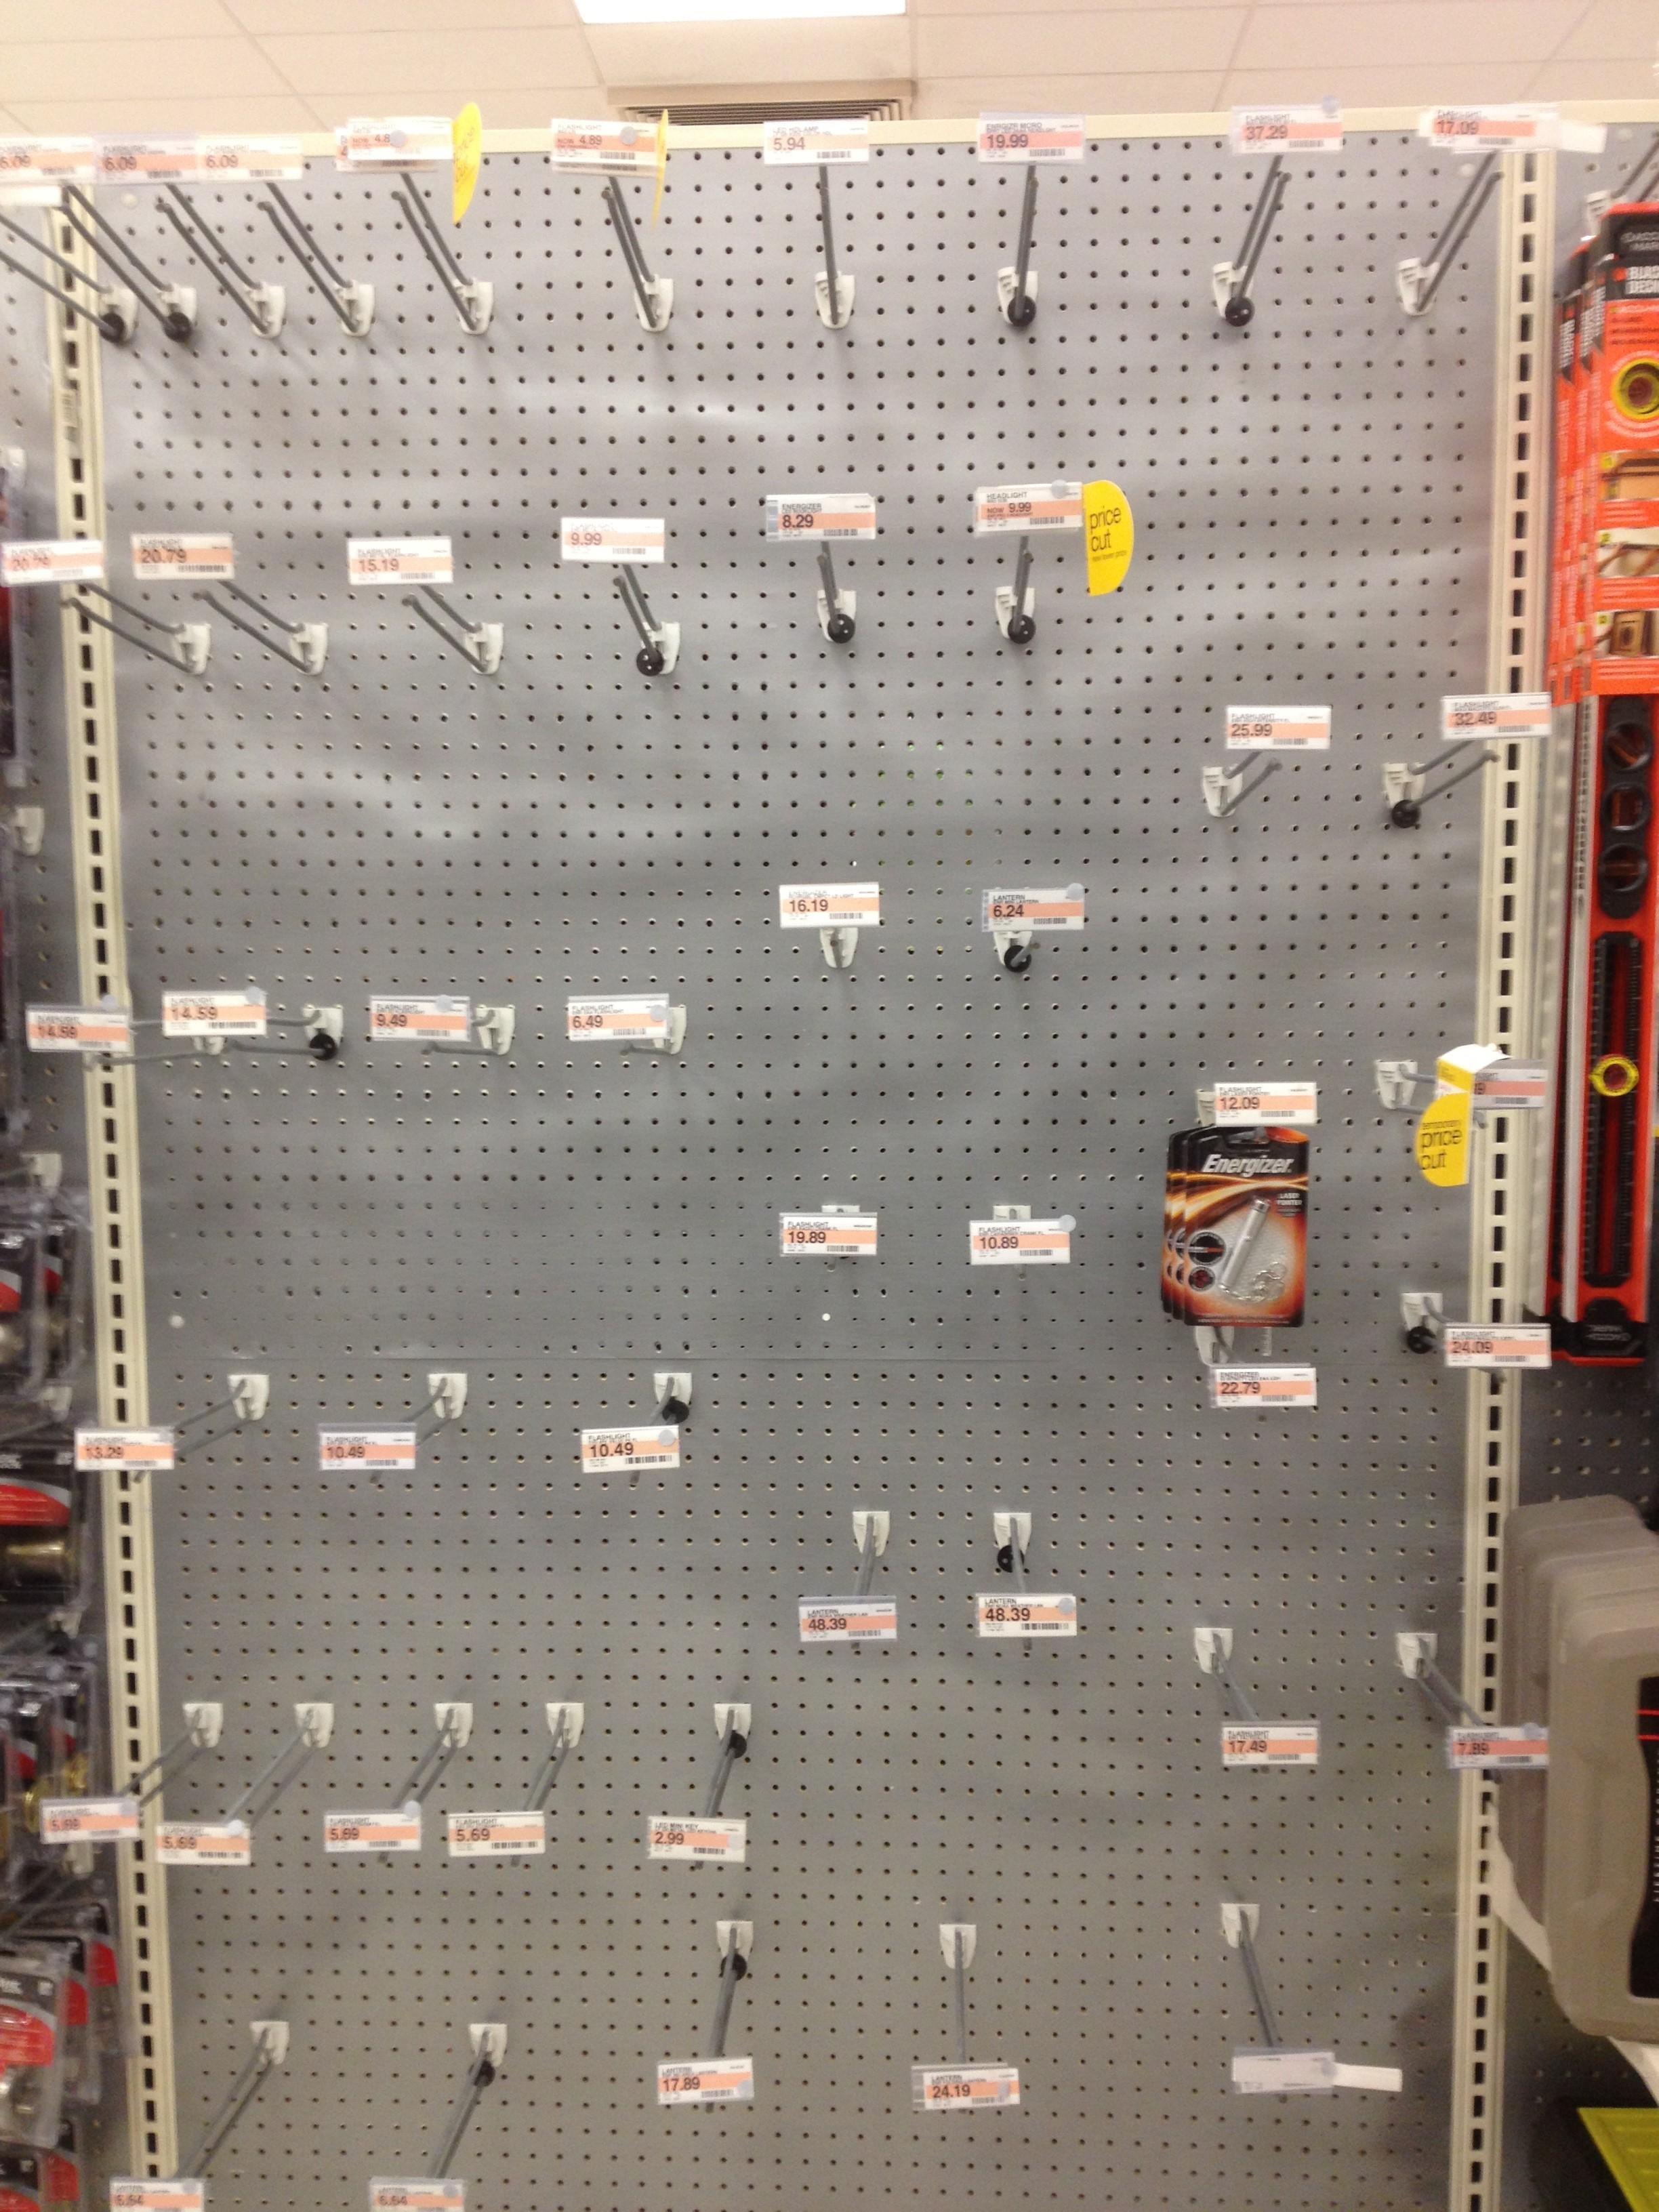 Target's Flashlights